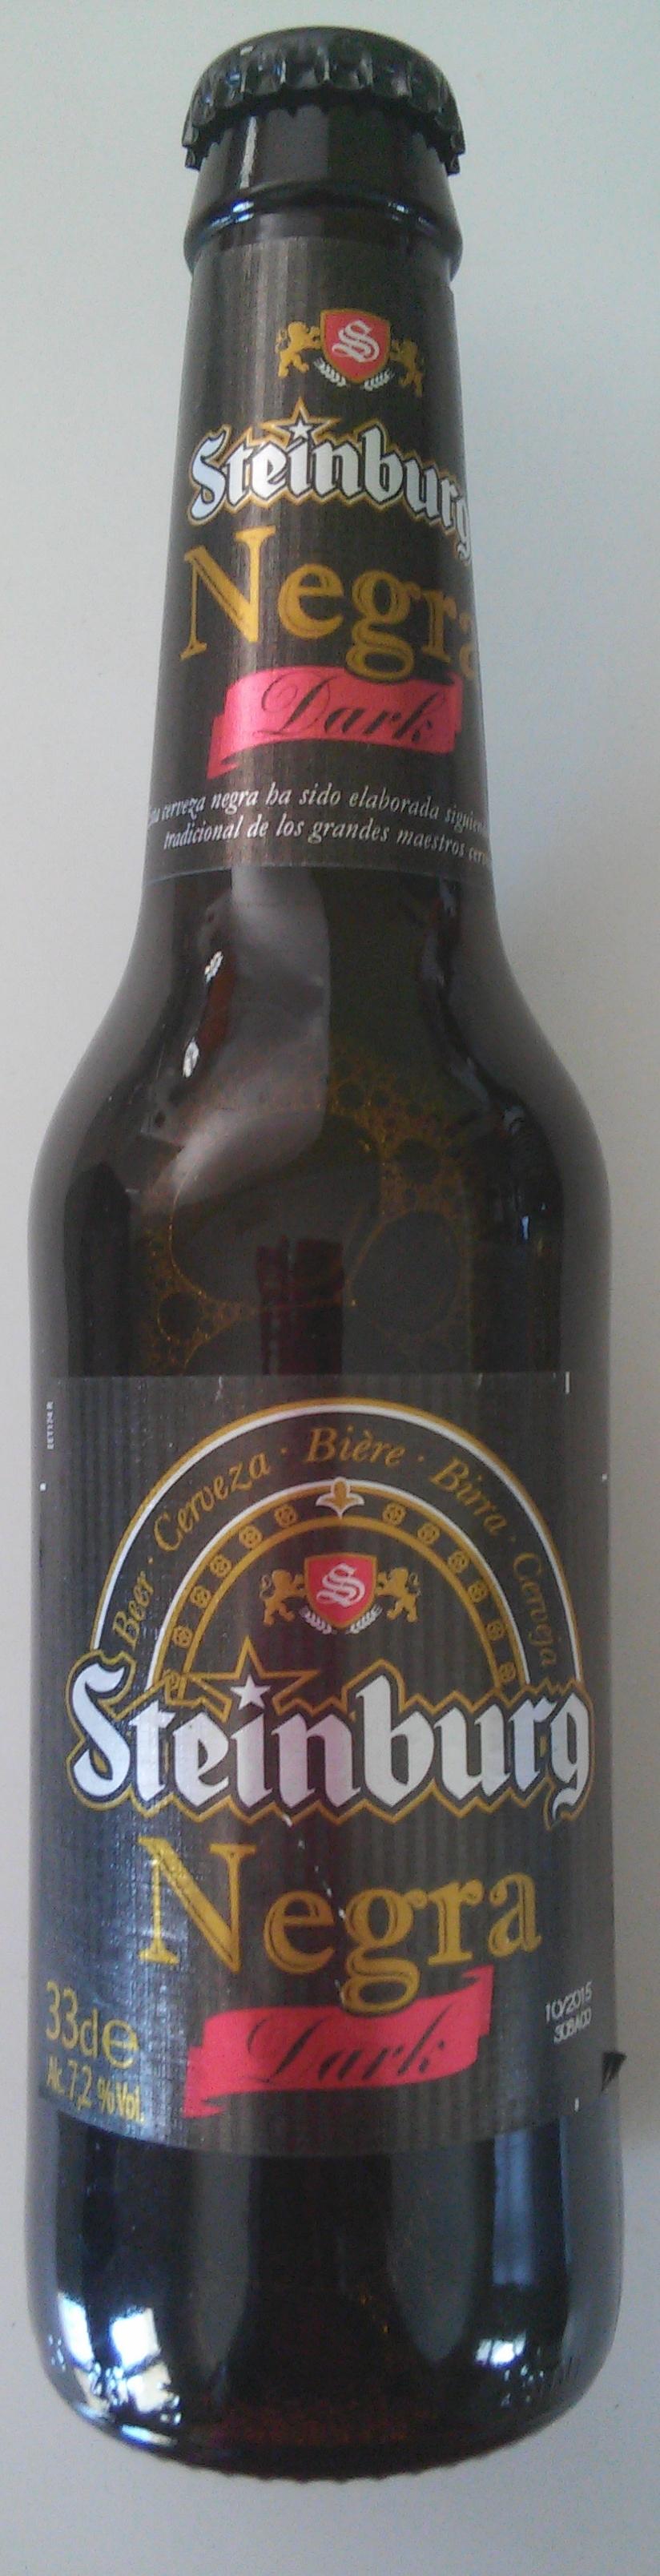 Cerveza negra - Ingredientes - es